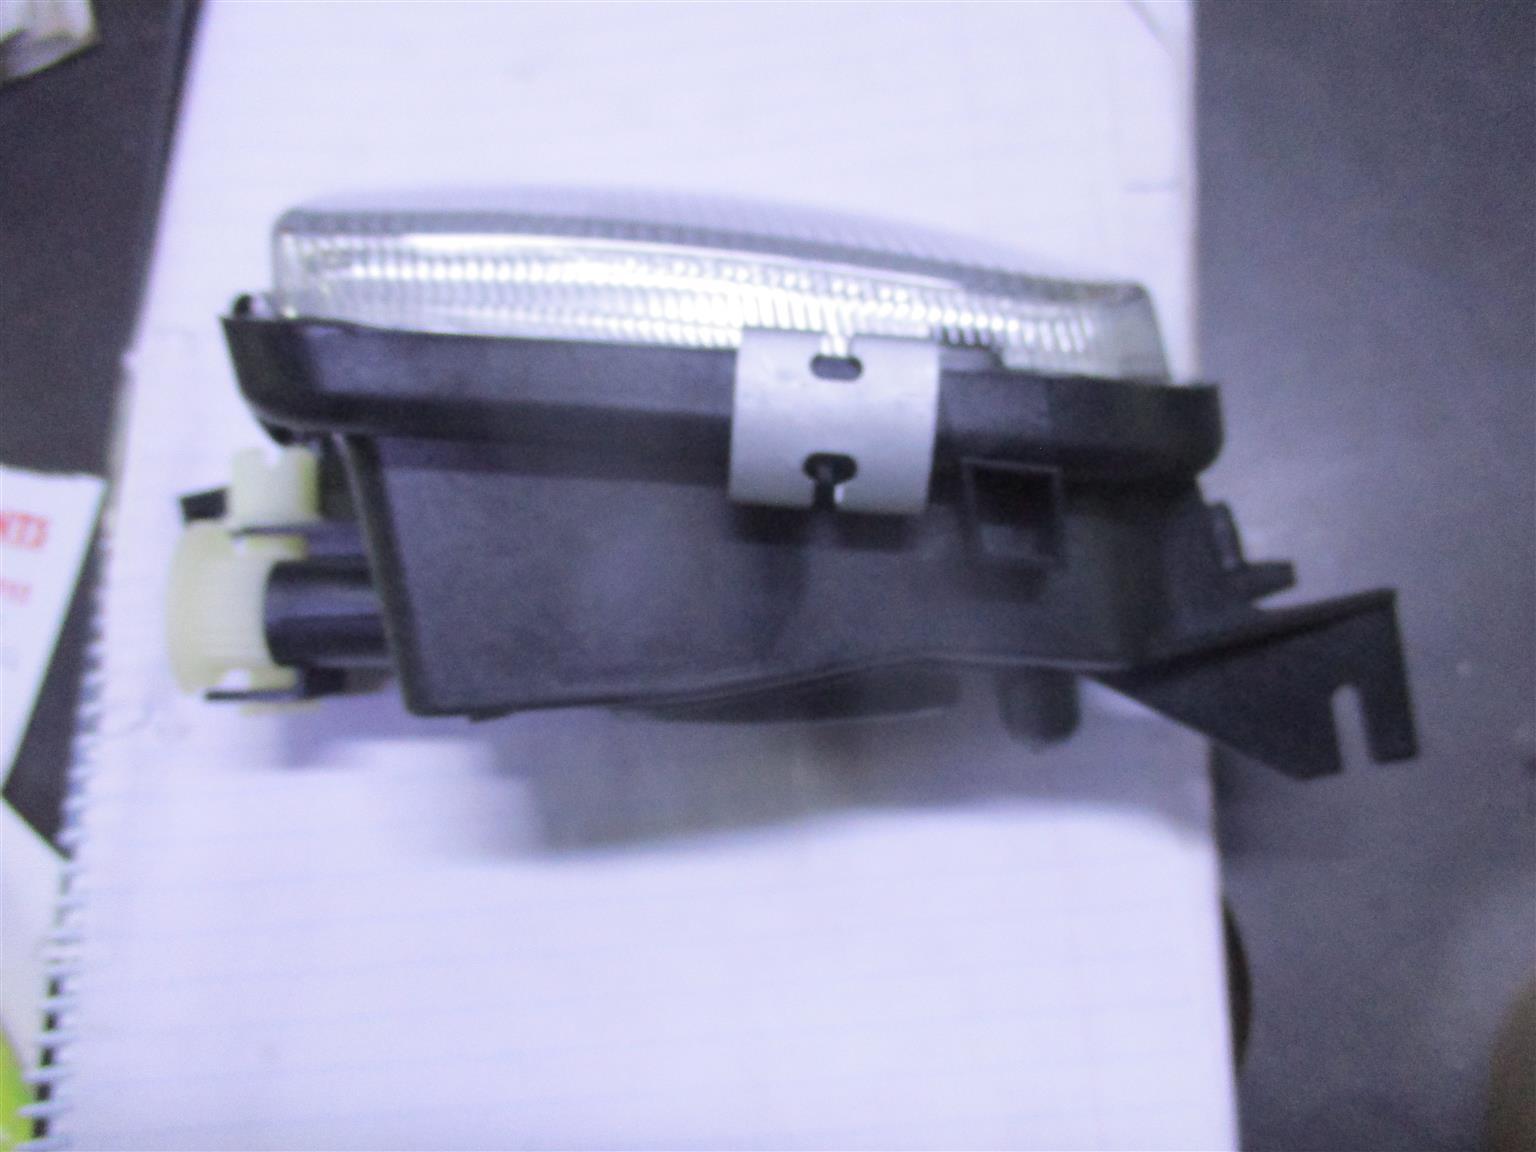 Mercede Benz W203 pre-face left hand side fog light for sale